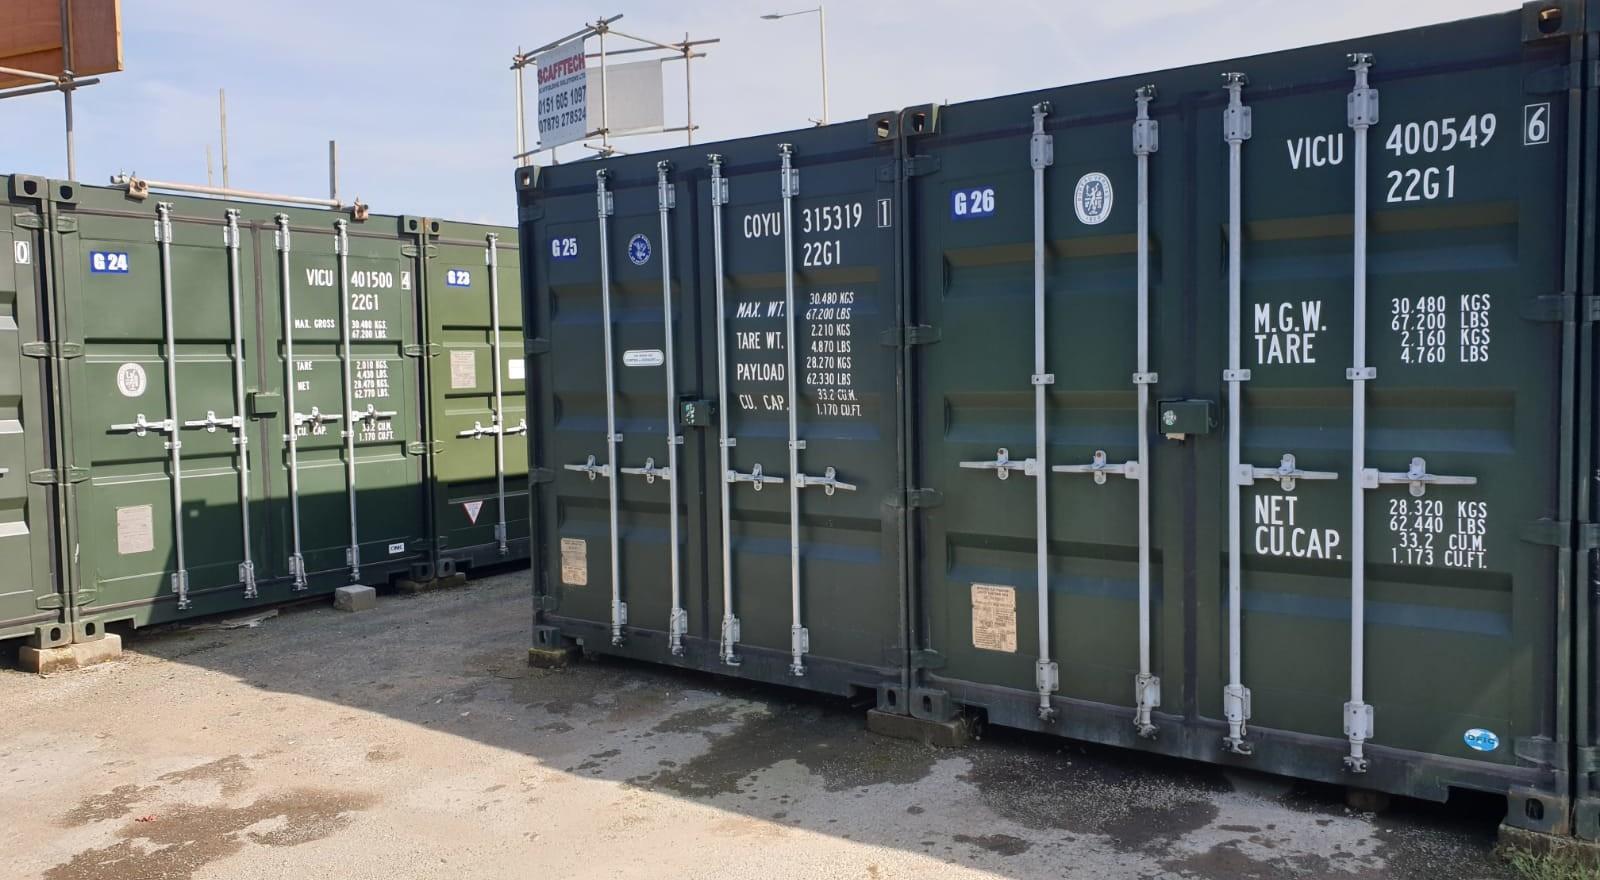 Ellesmere Port Storage